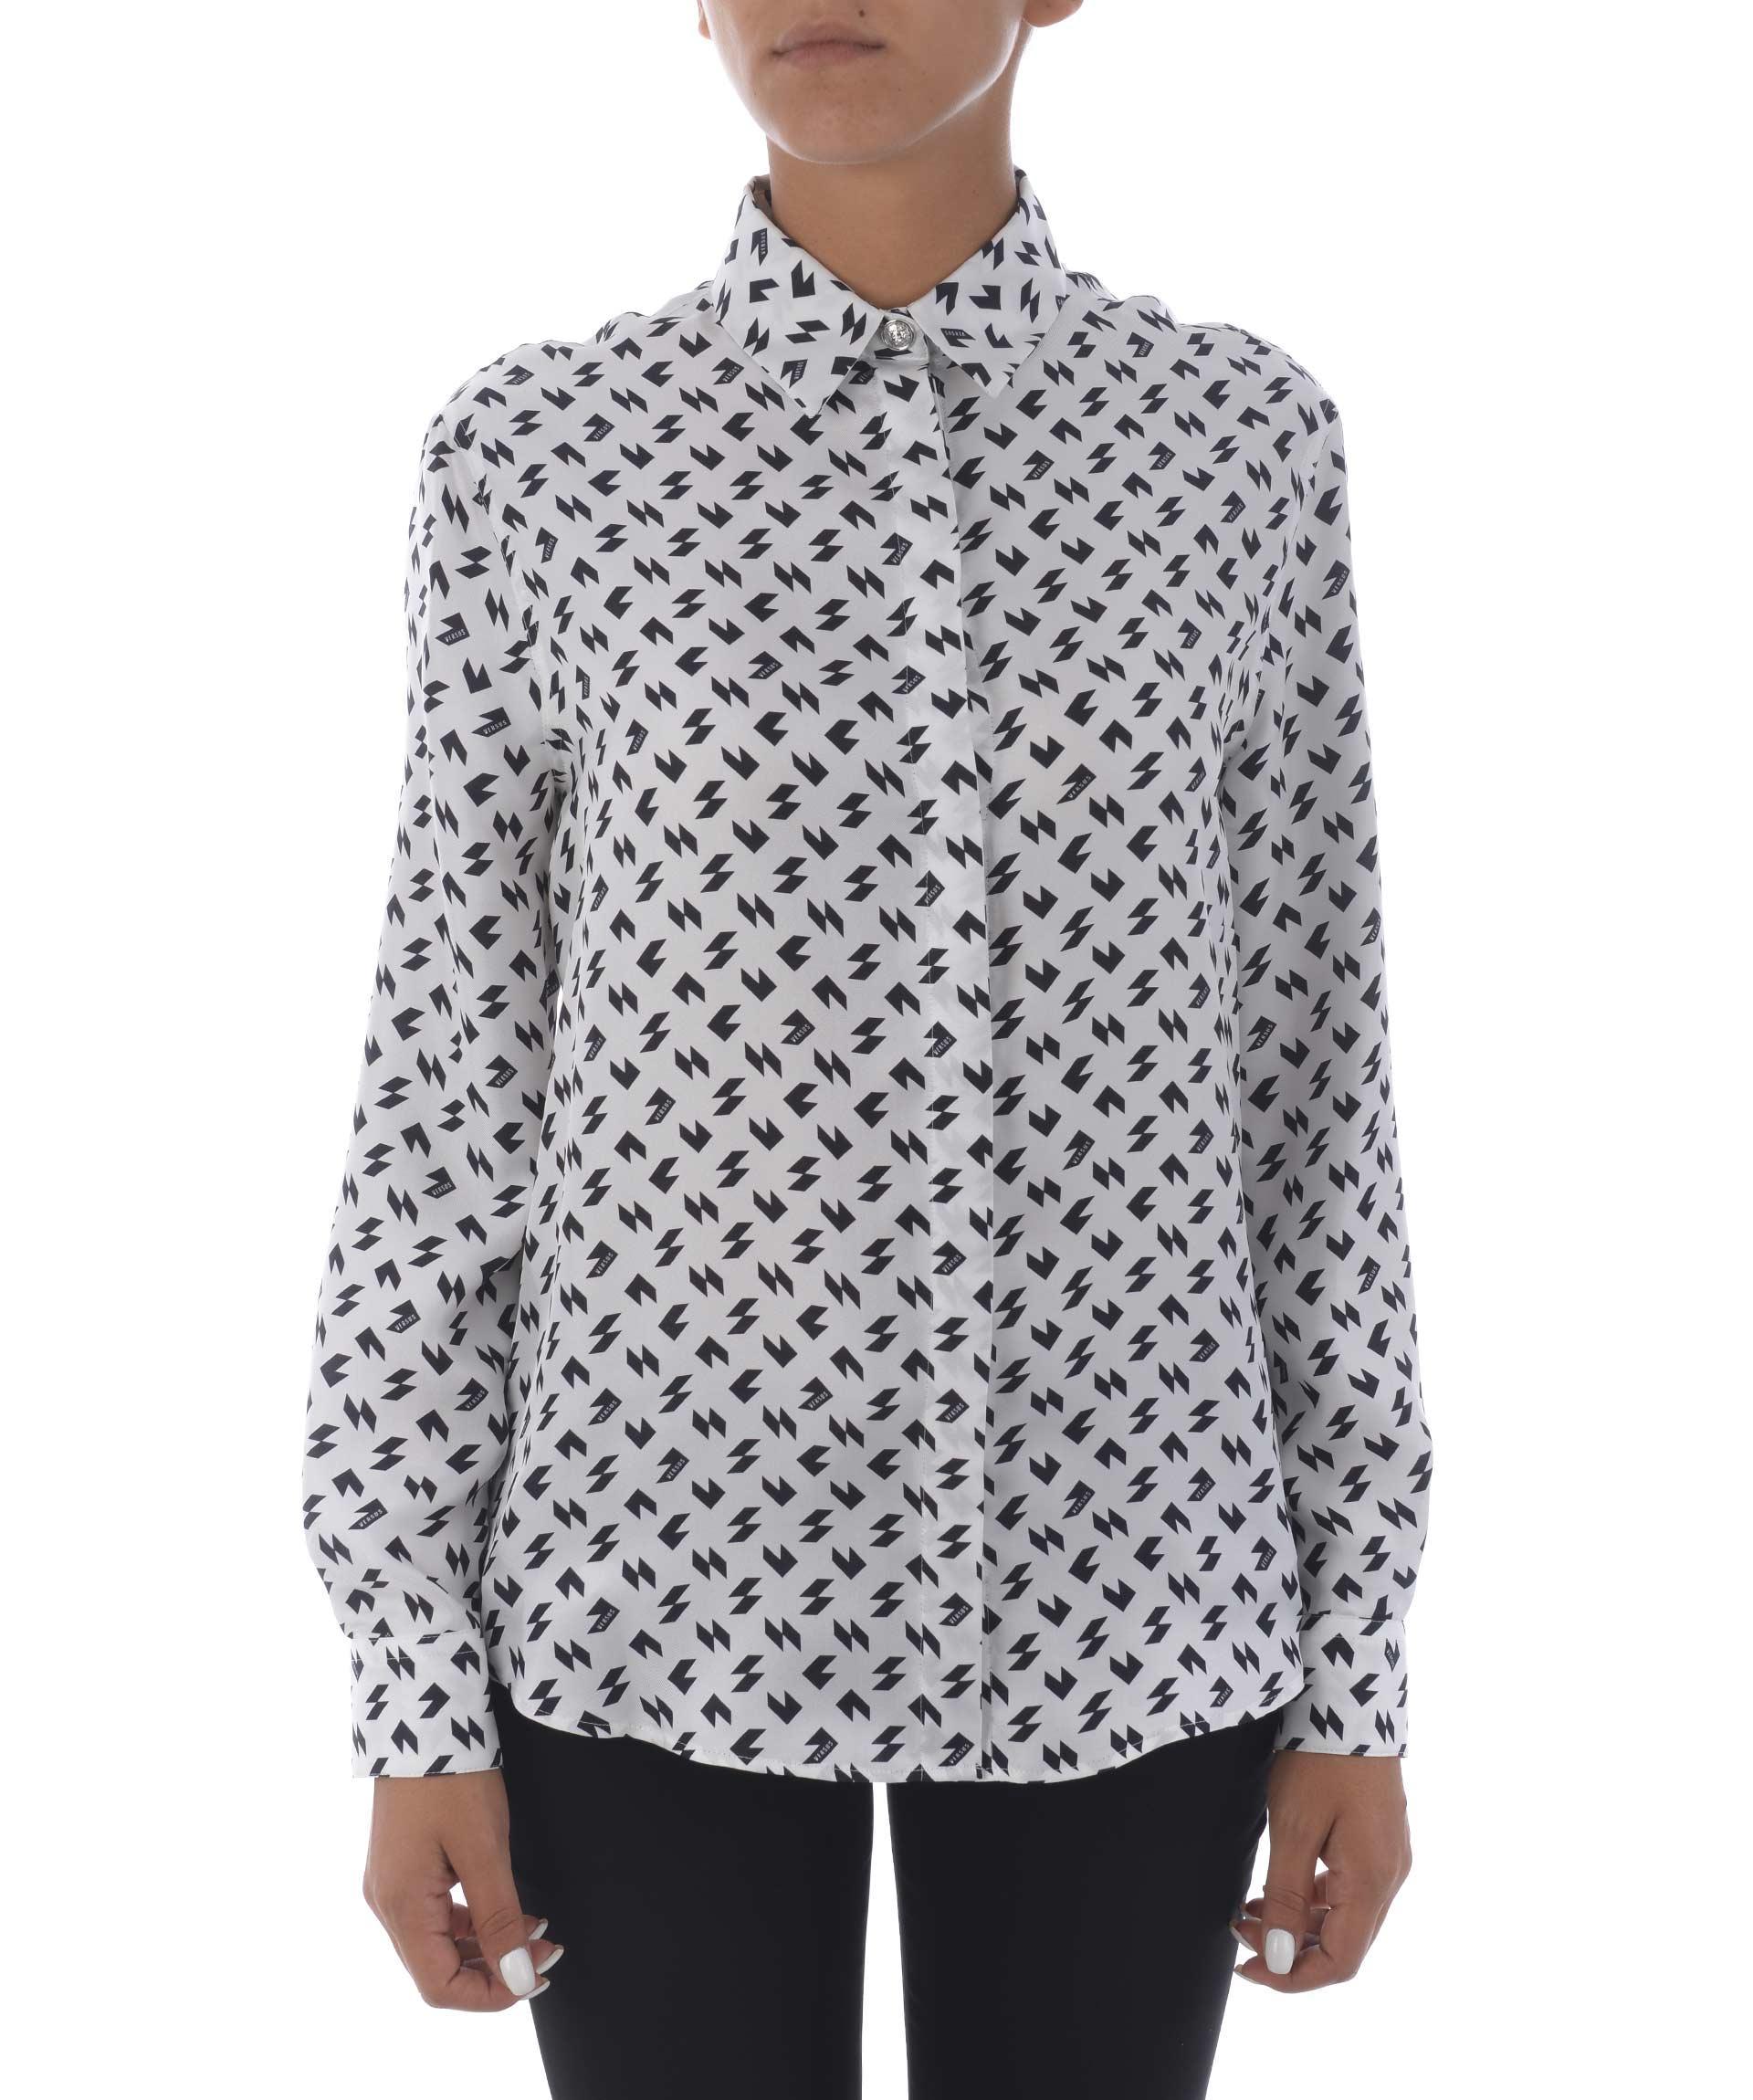 Versus Printed Shirt In Bianco/Nero